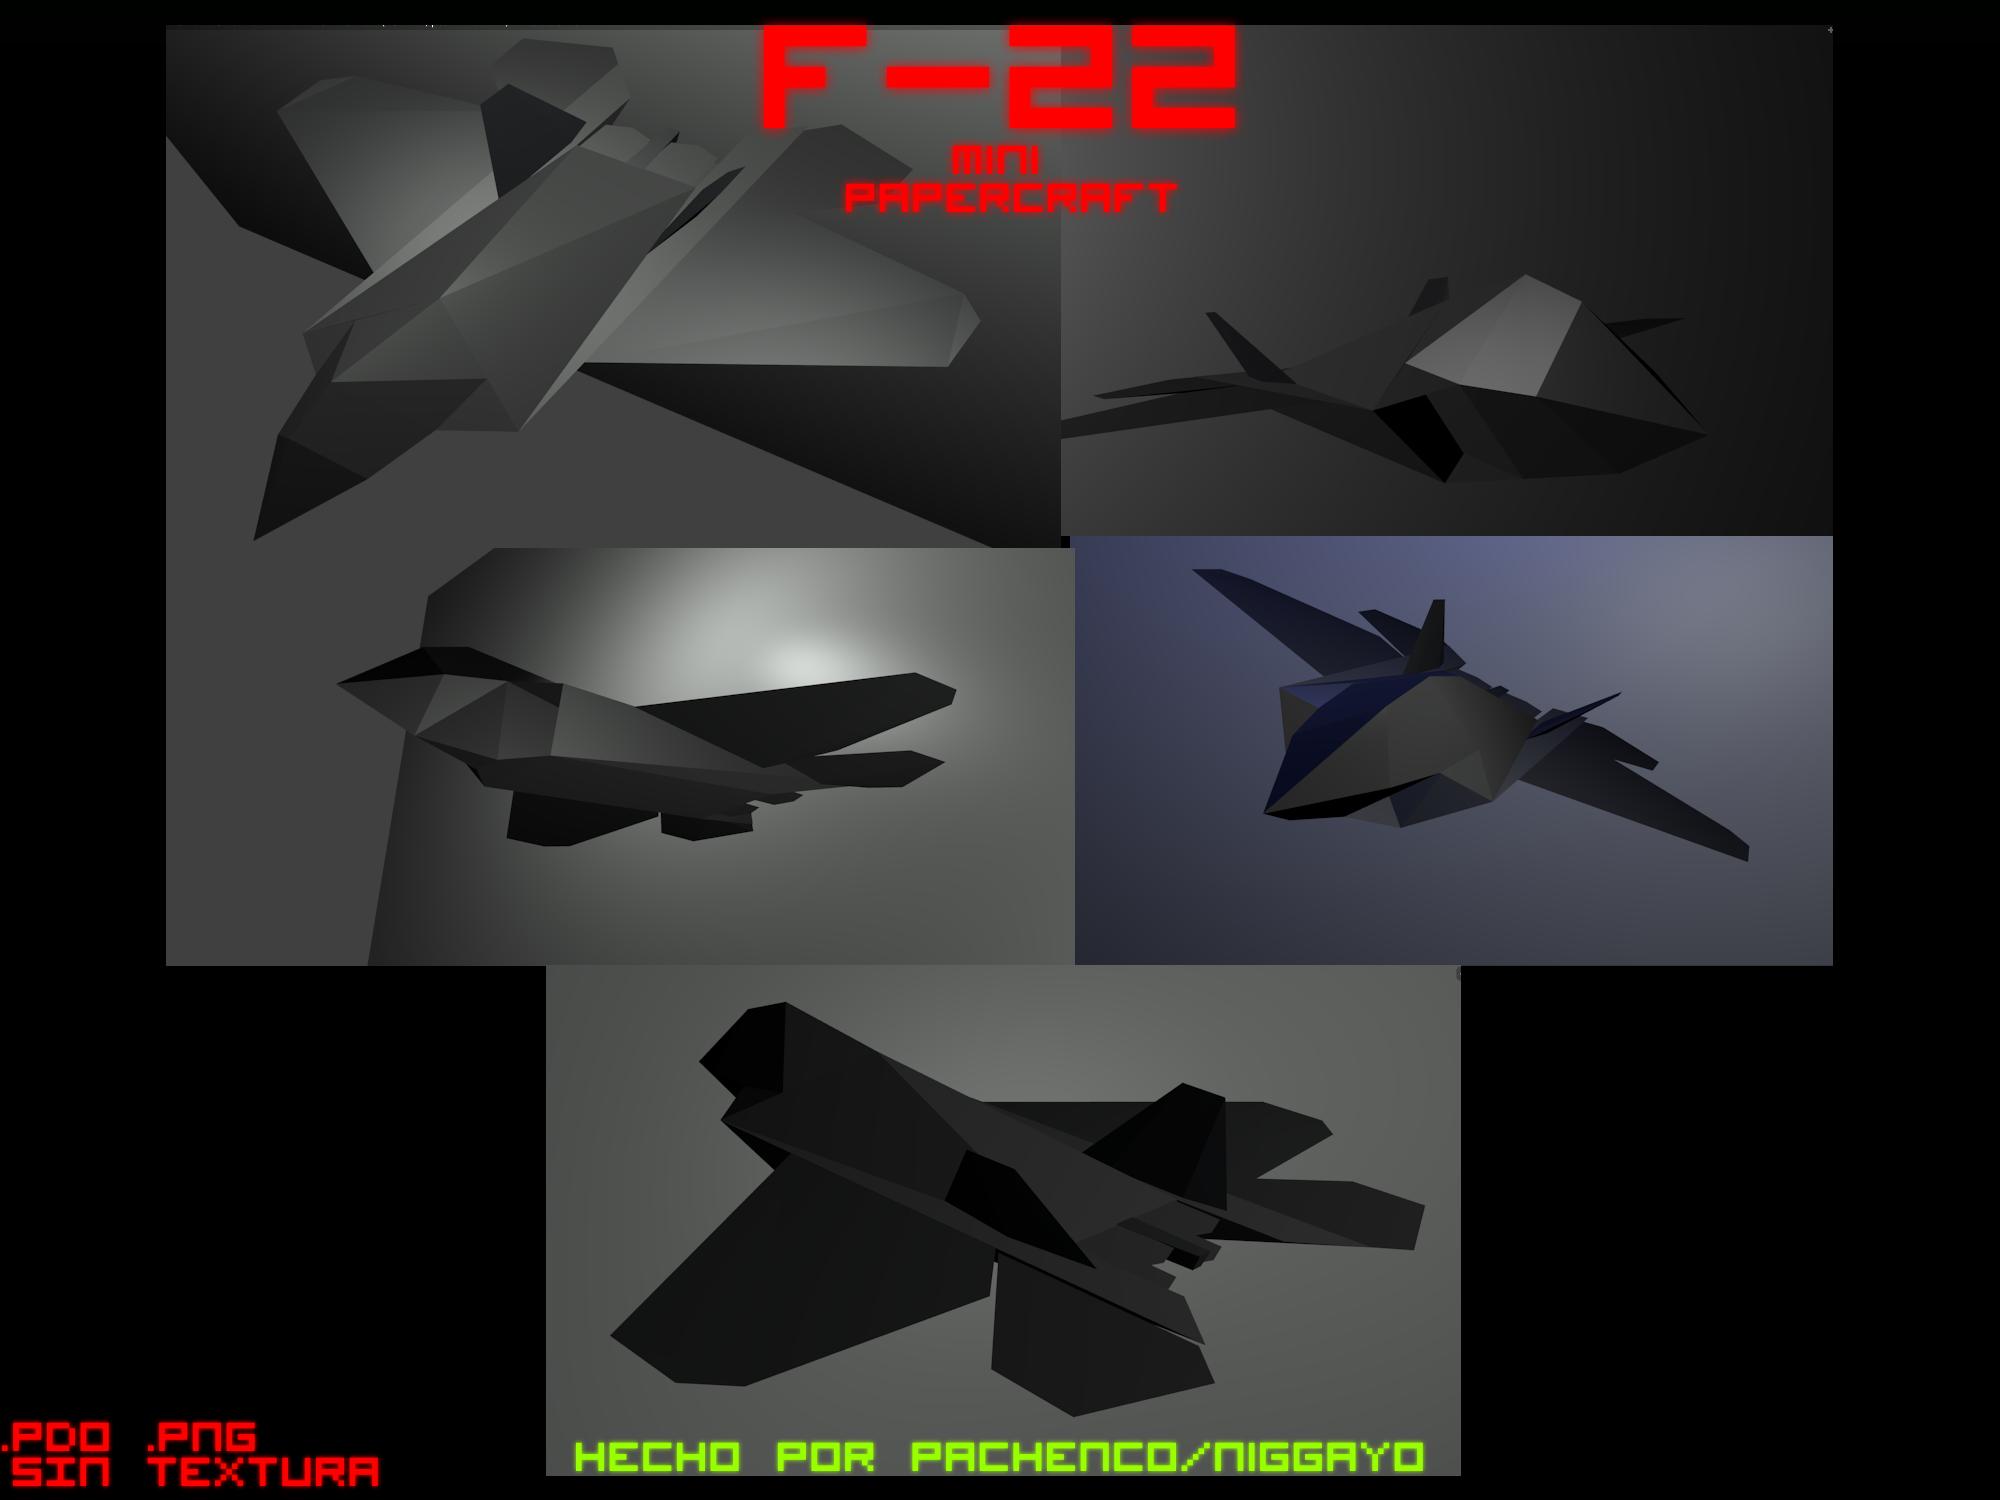 F-22 Mini Papercraft